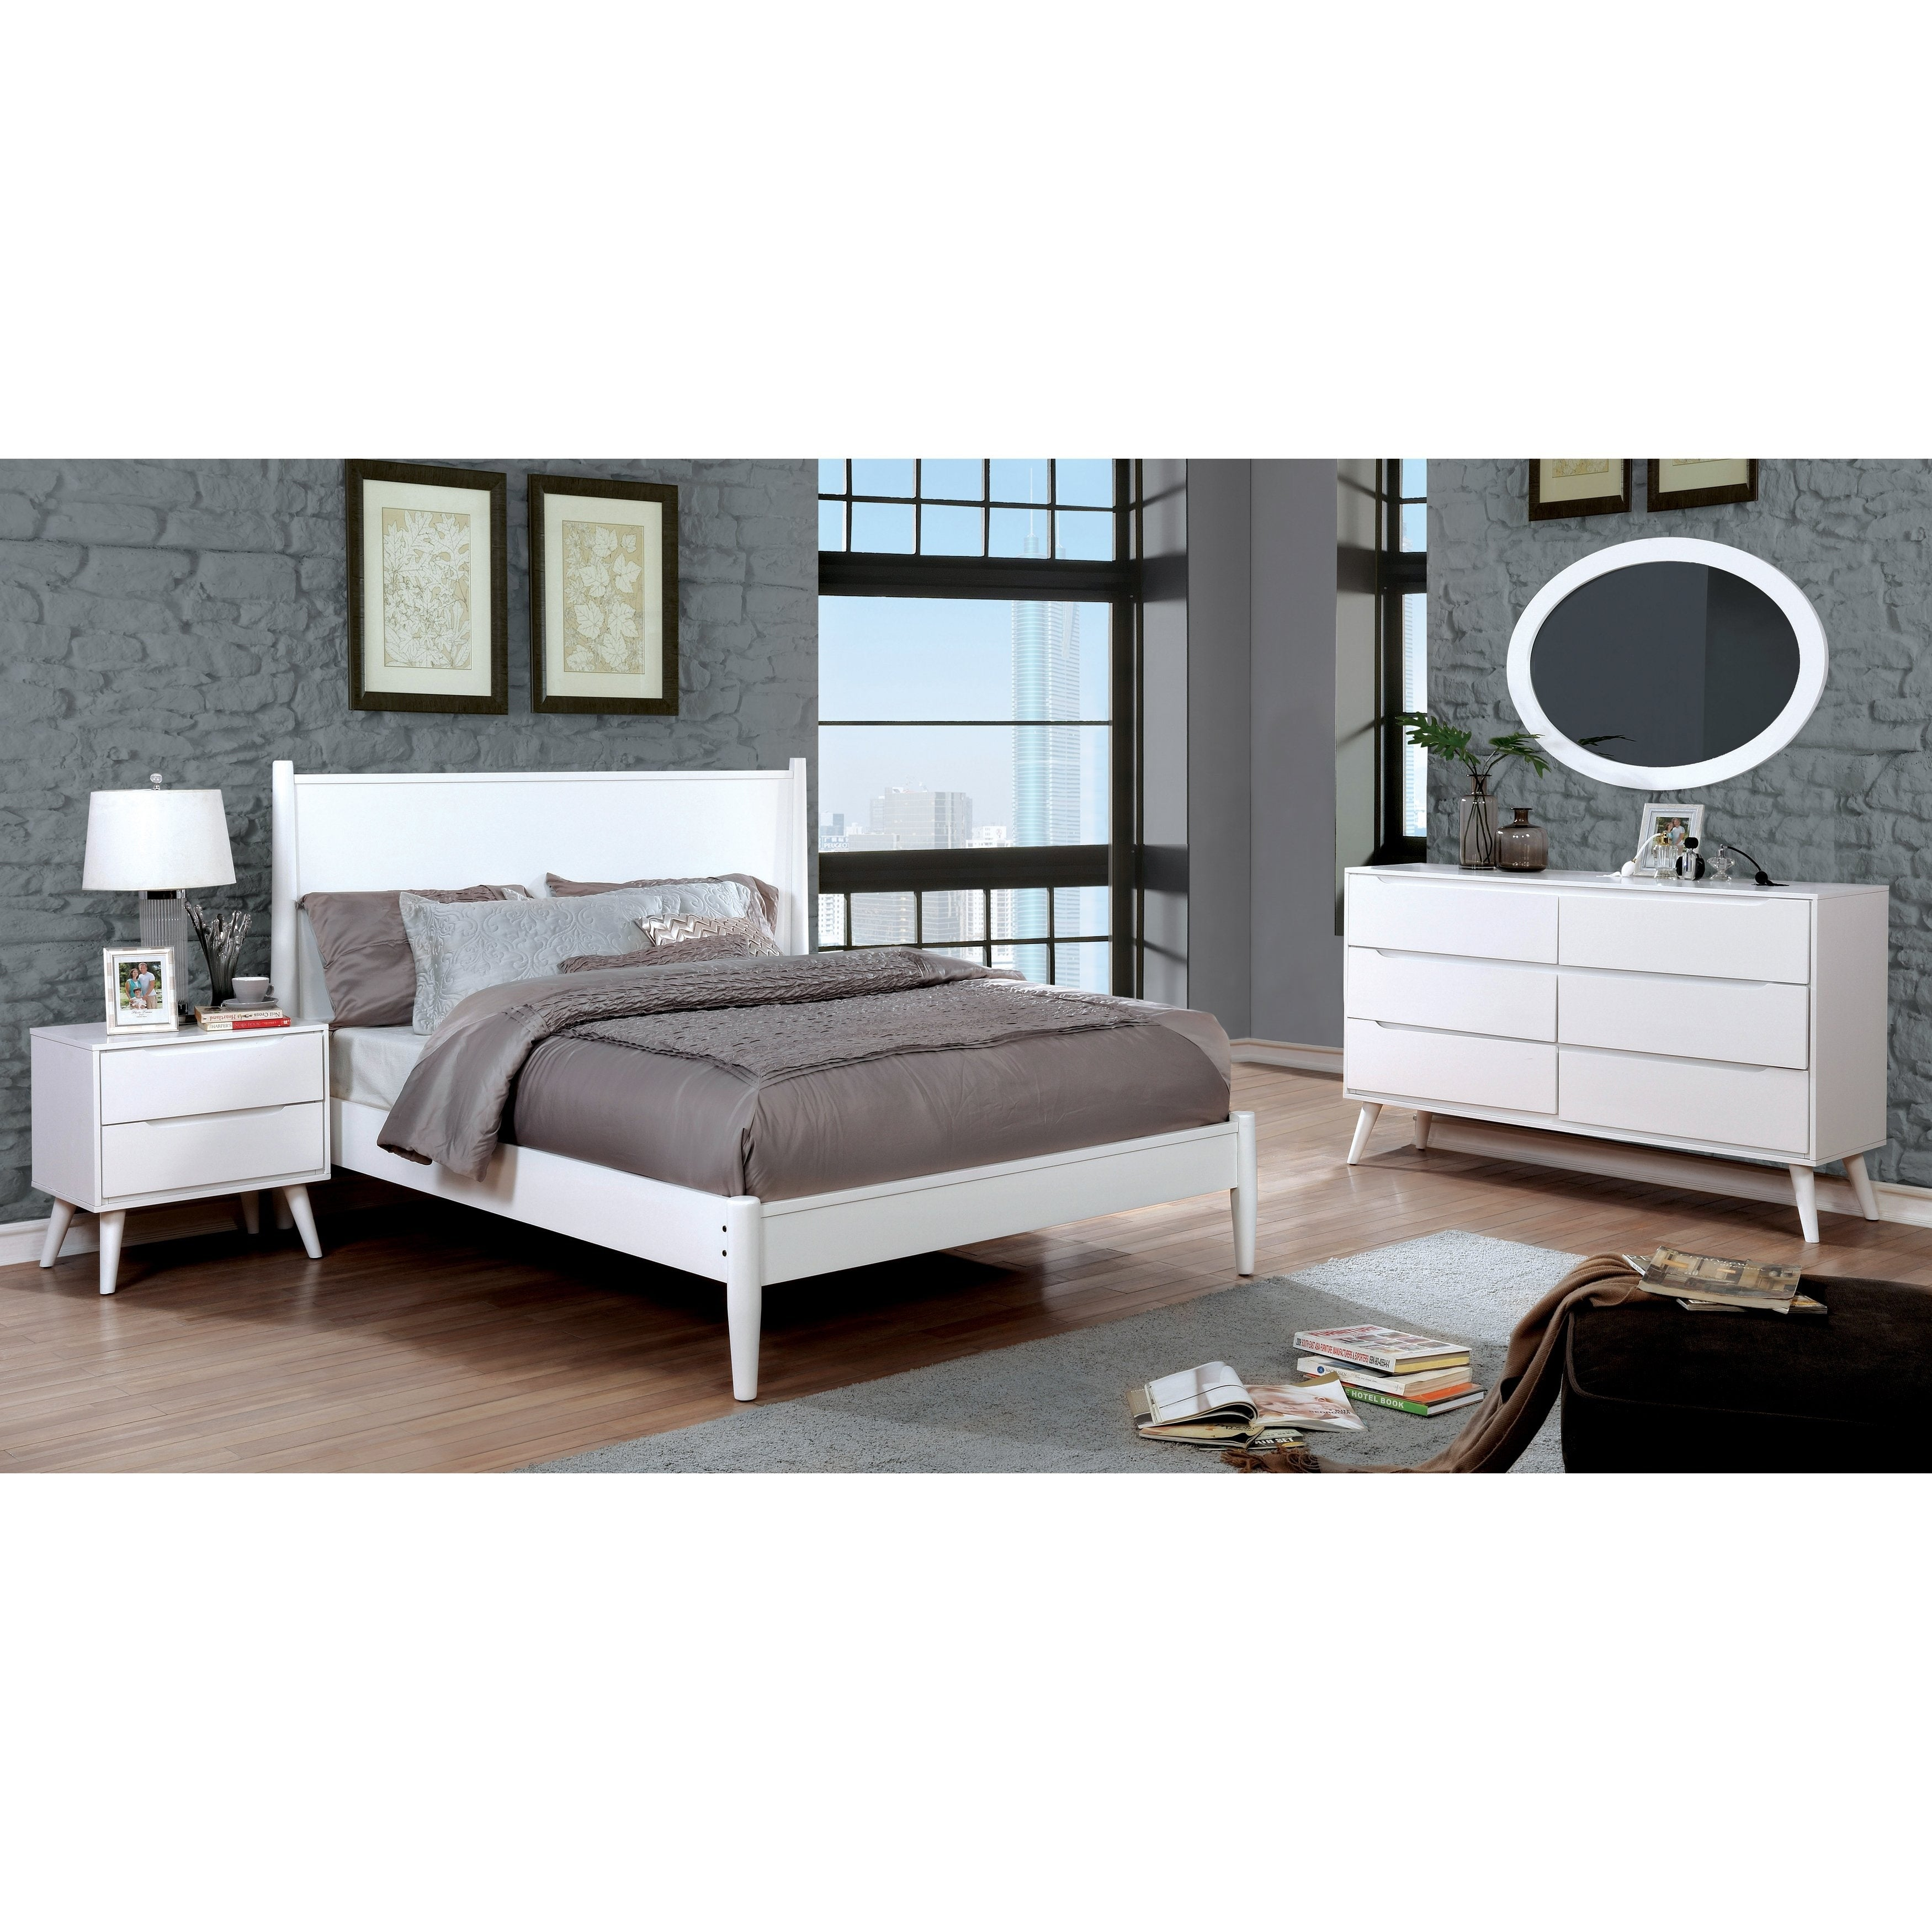 Corrine II Mid-Century Modern White 4-piece Bedroom Set